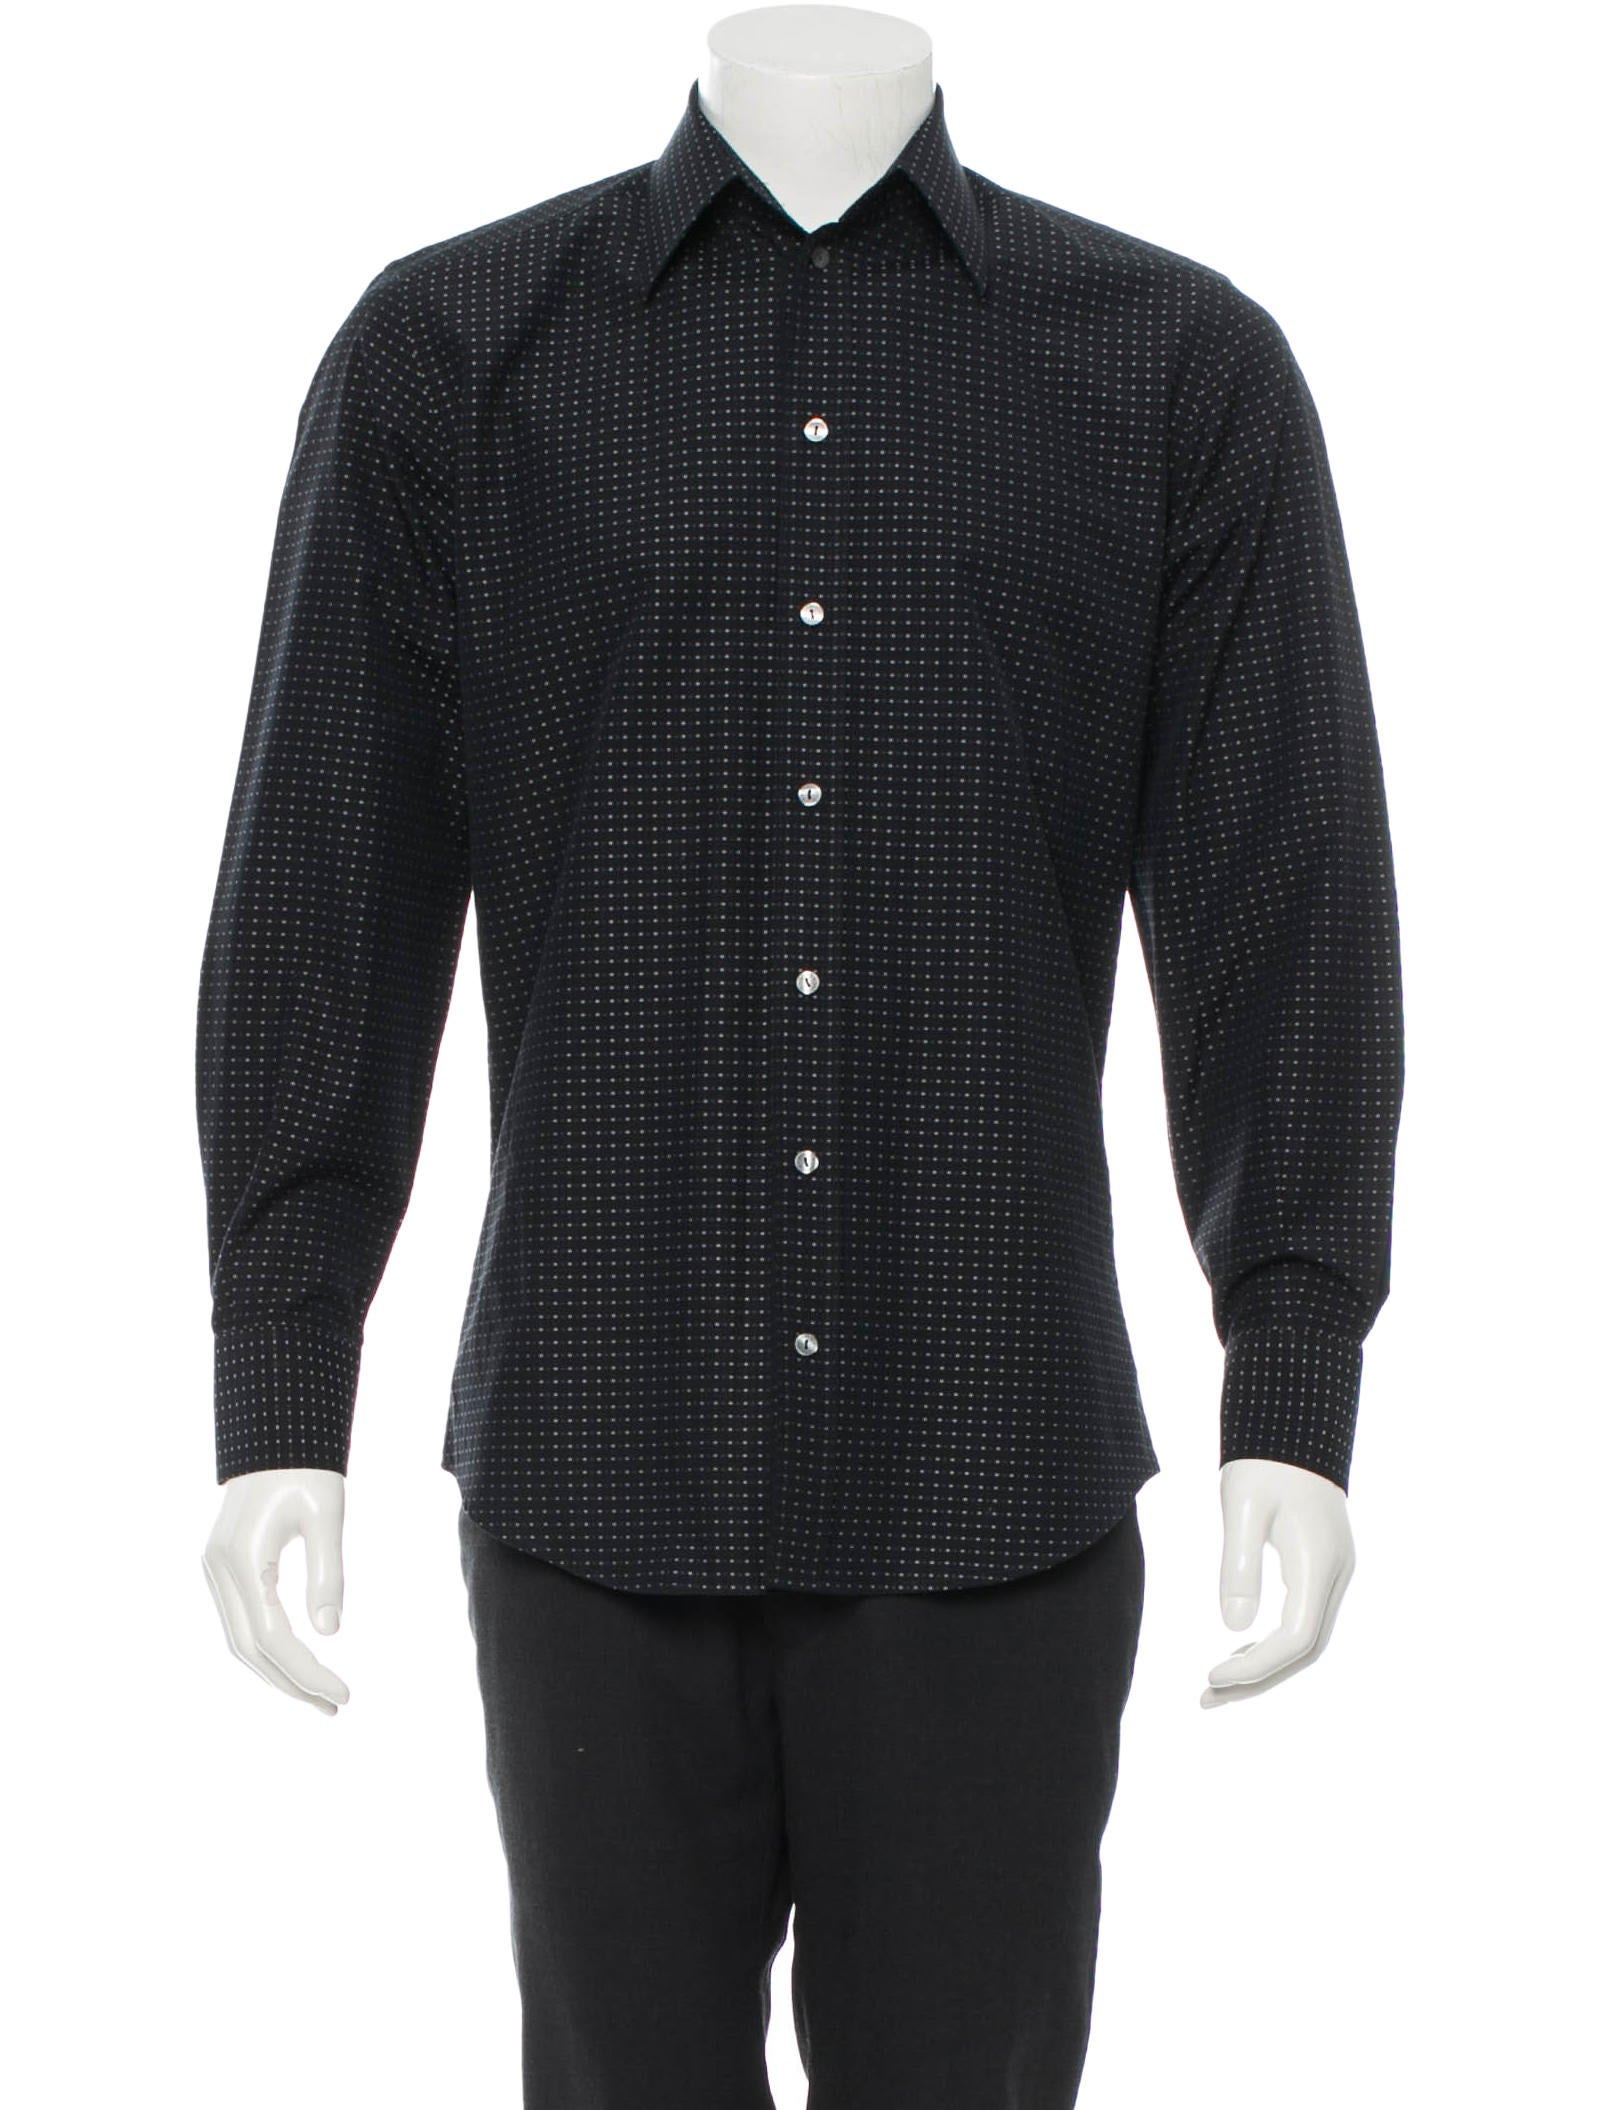 Dolce gabbana tailored fit button up shirt mens shirts for Fitted button up shirts mens